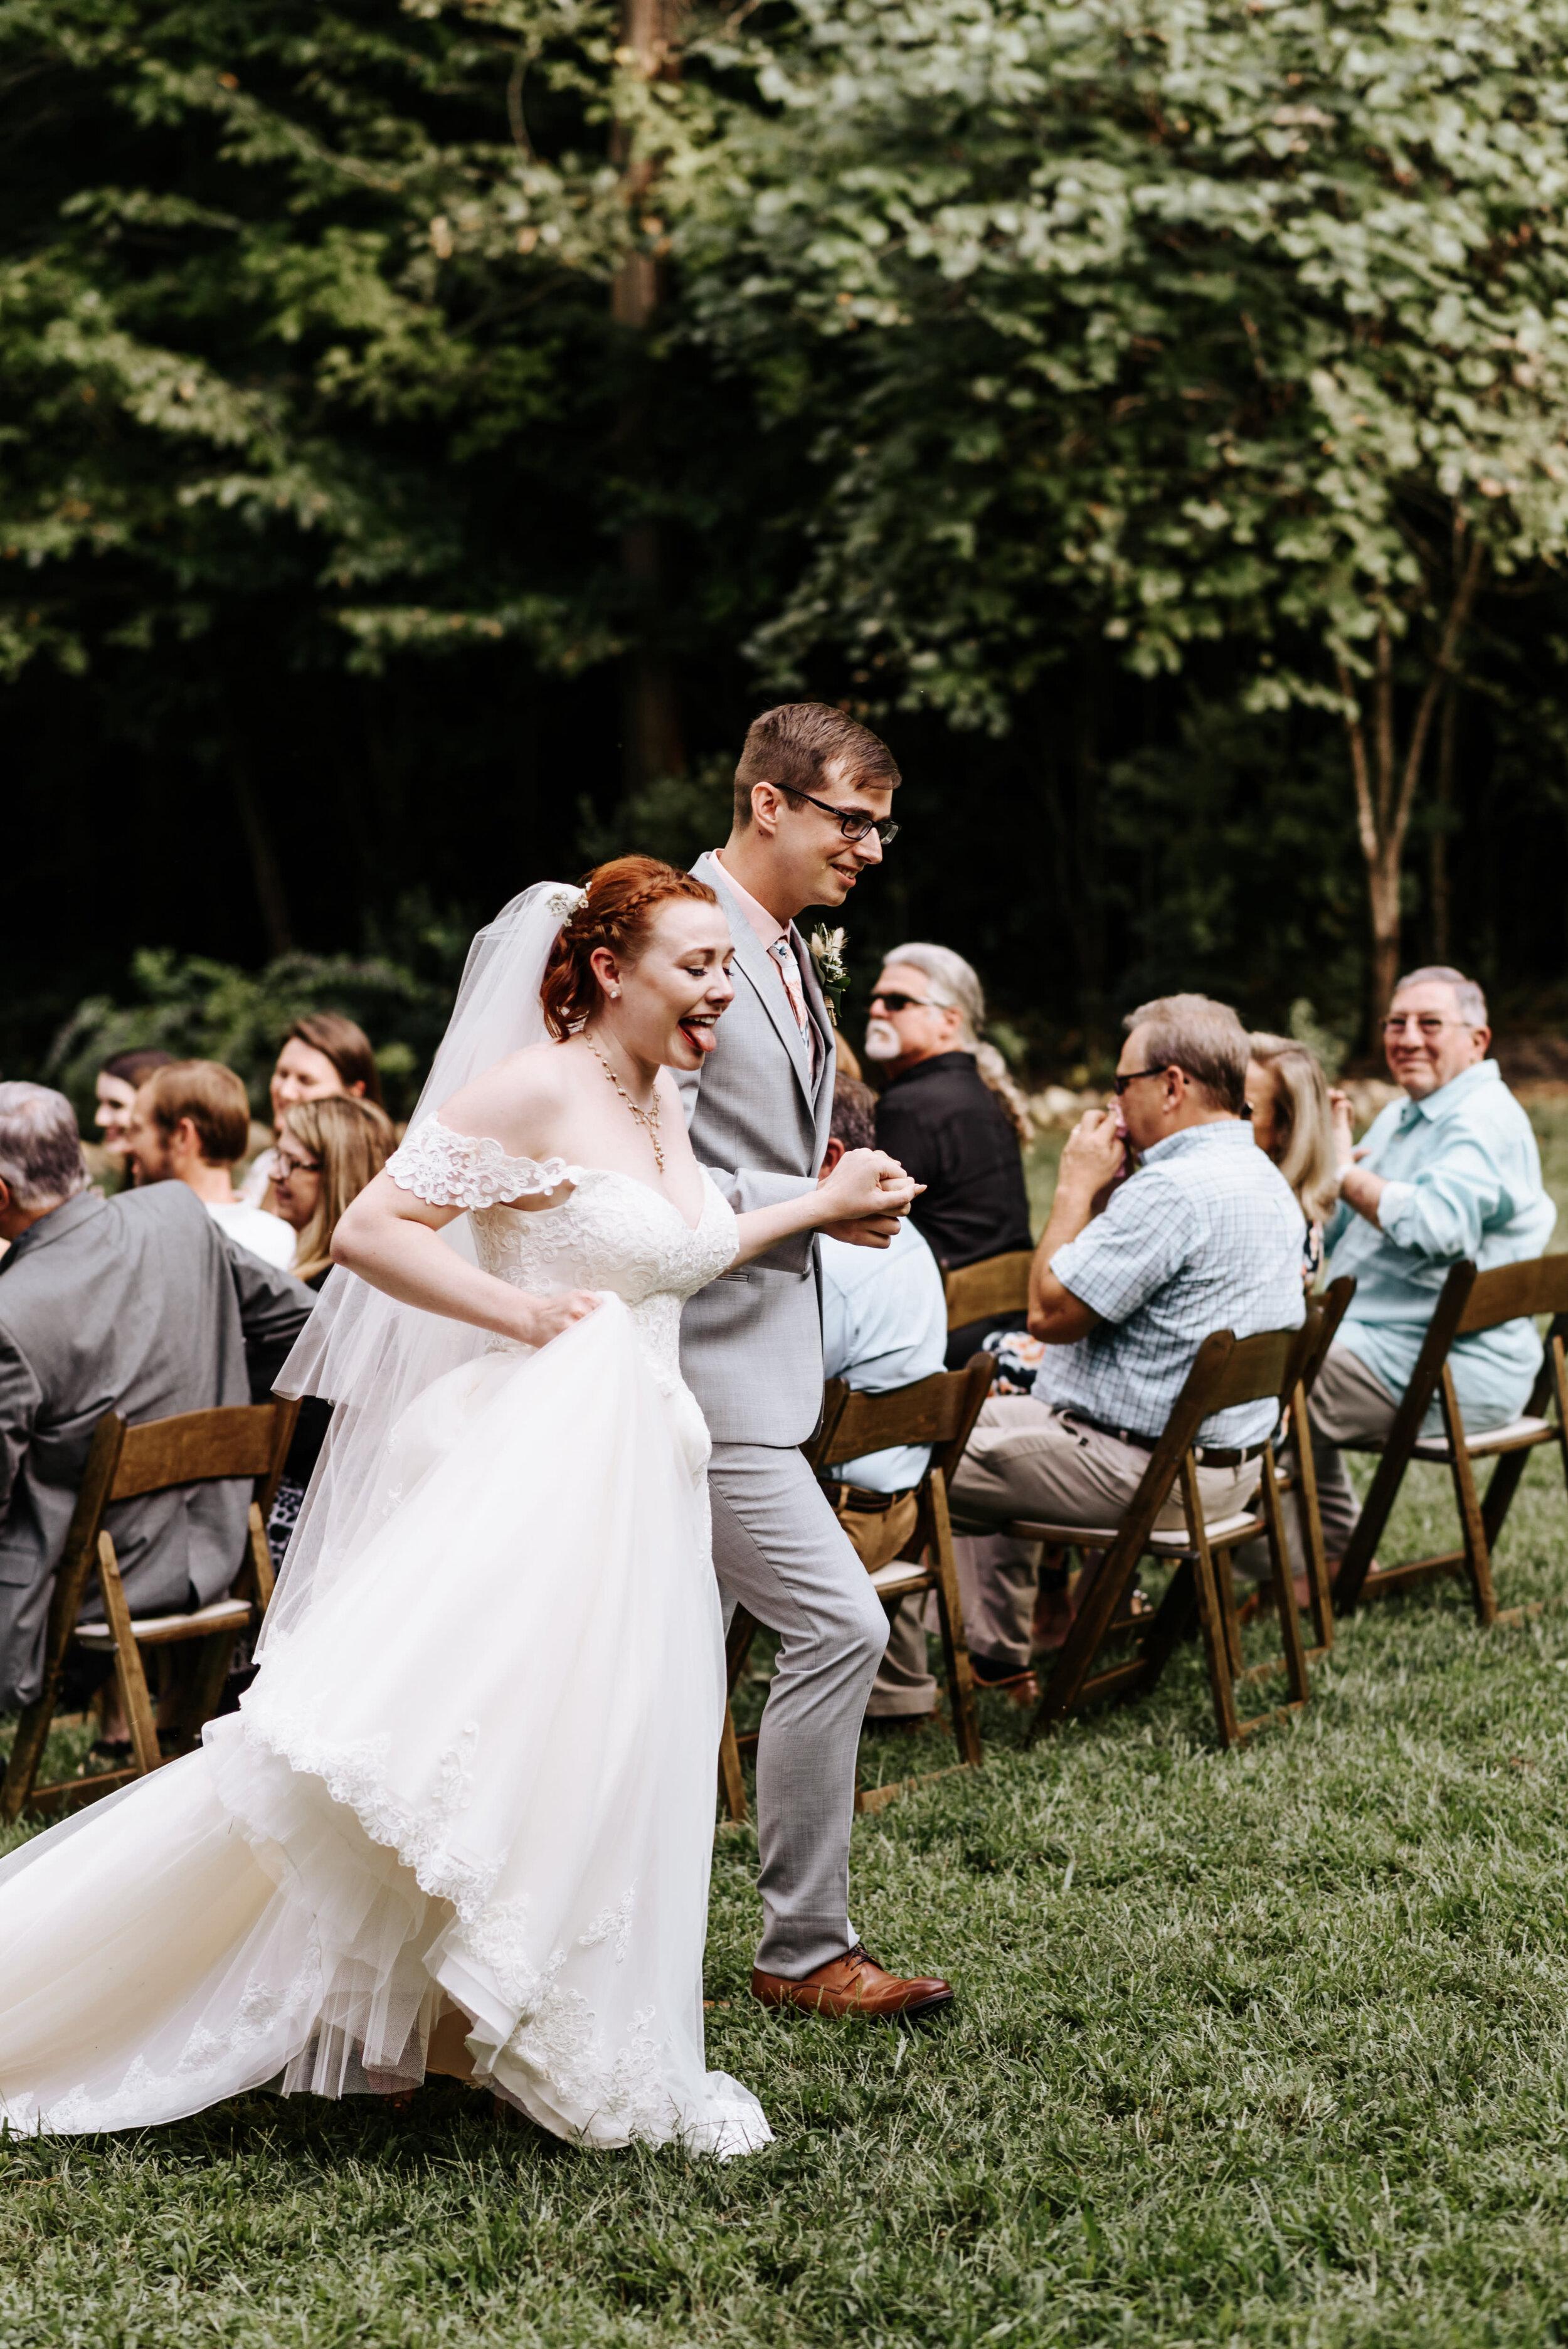 Rachel_David_Wedding_Richmond_Virginia_Photography_by_V_29.jpg